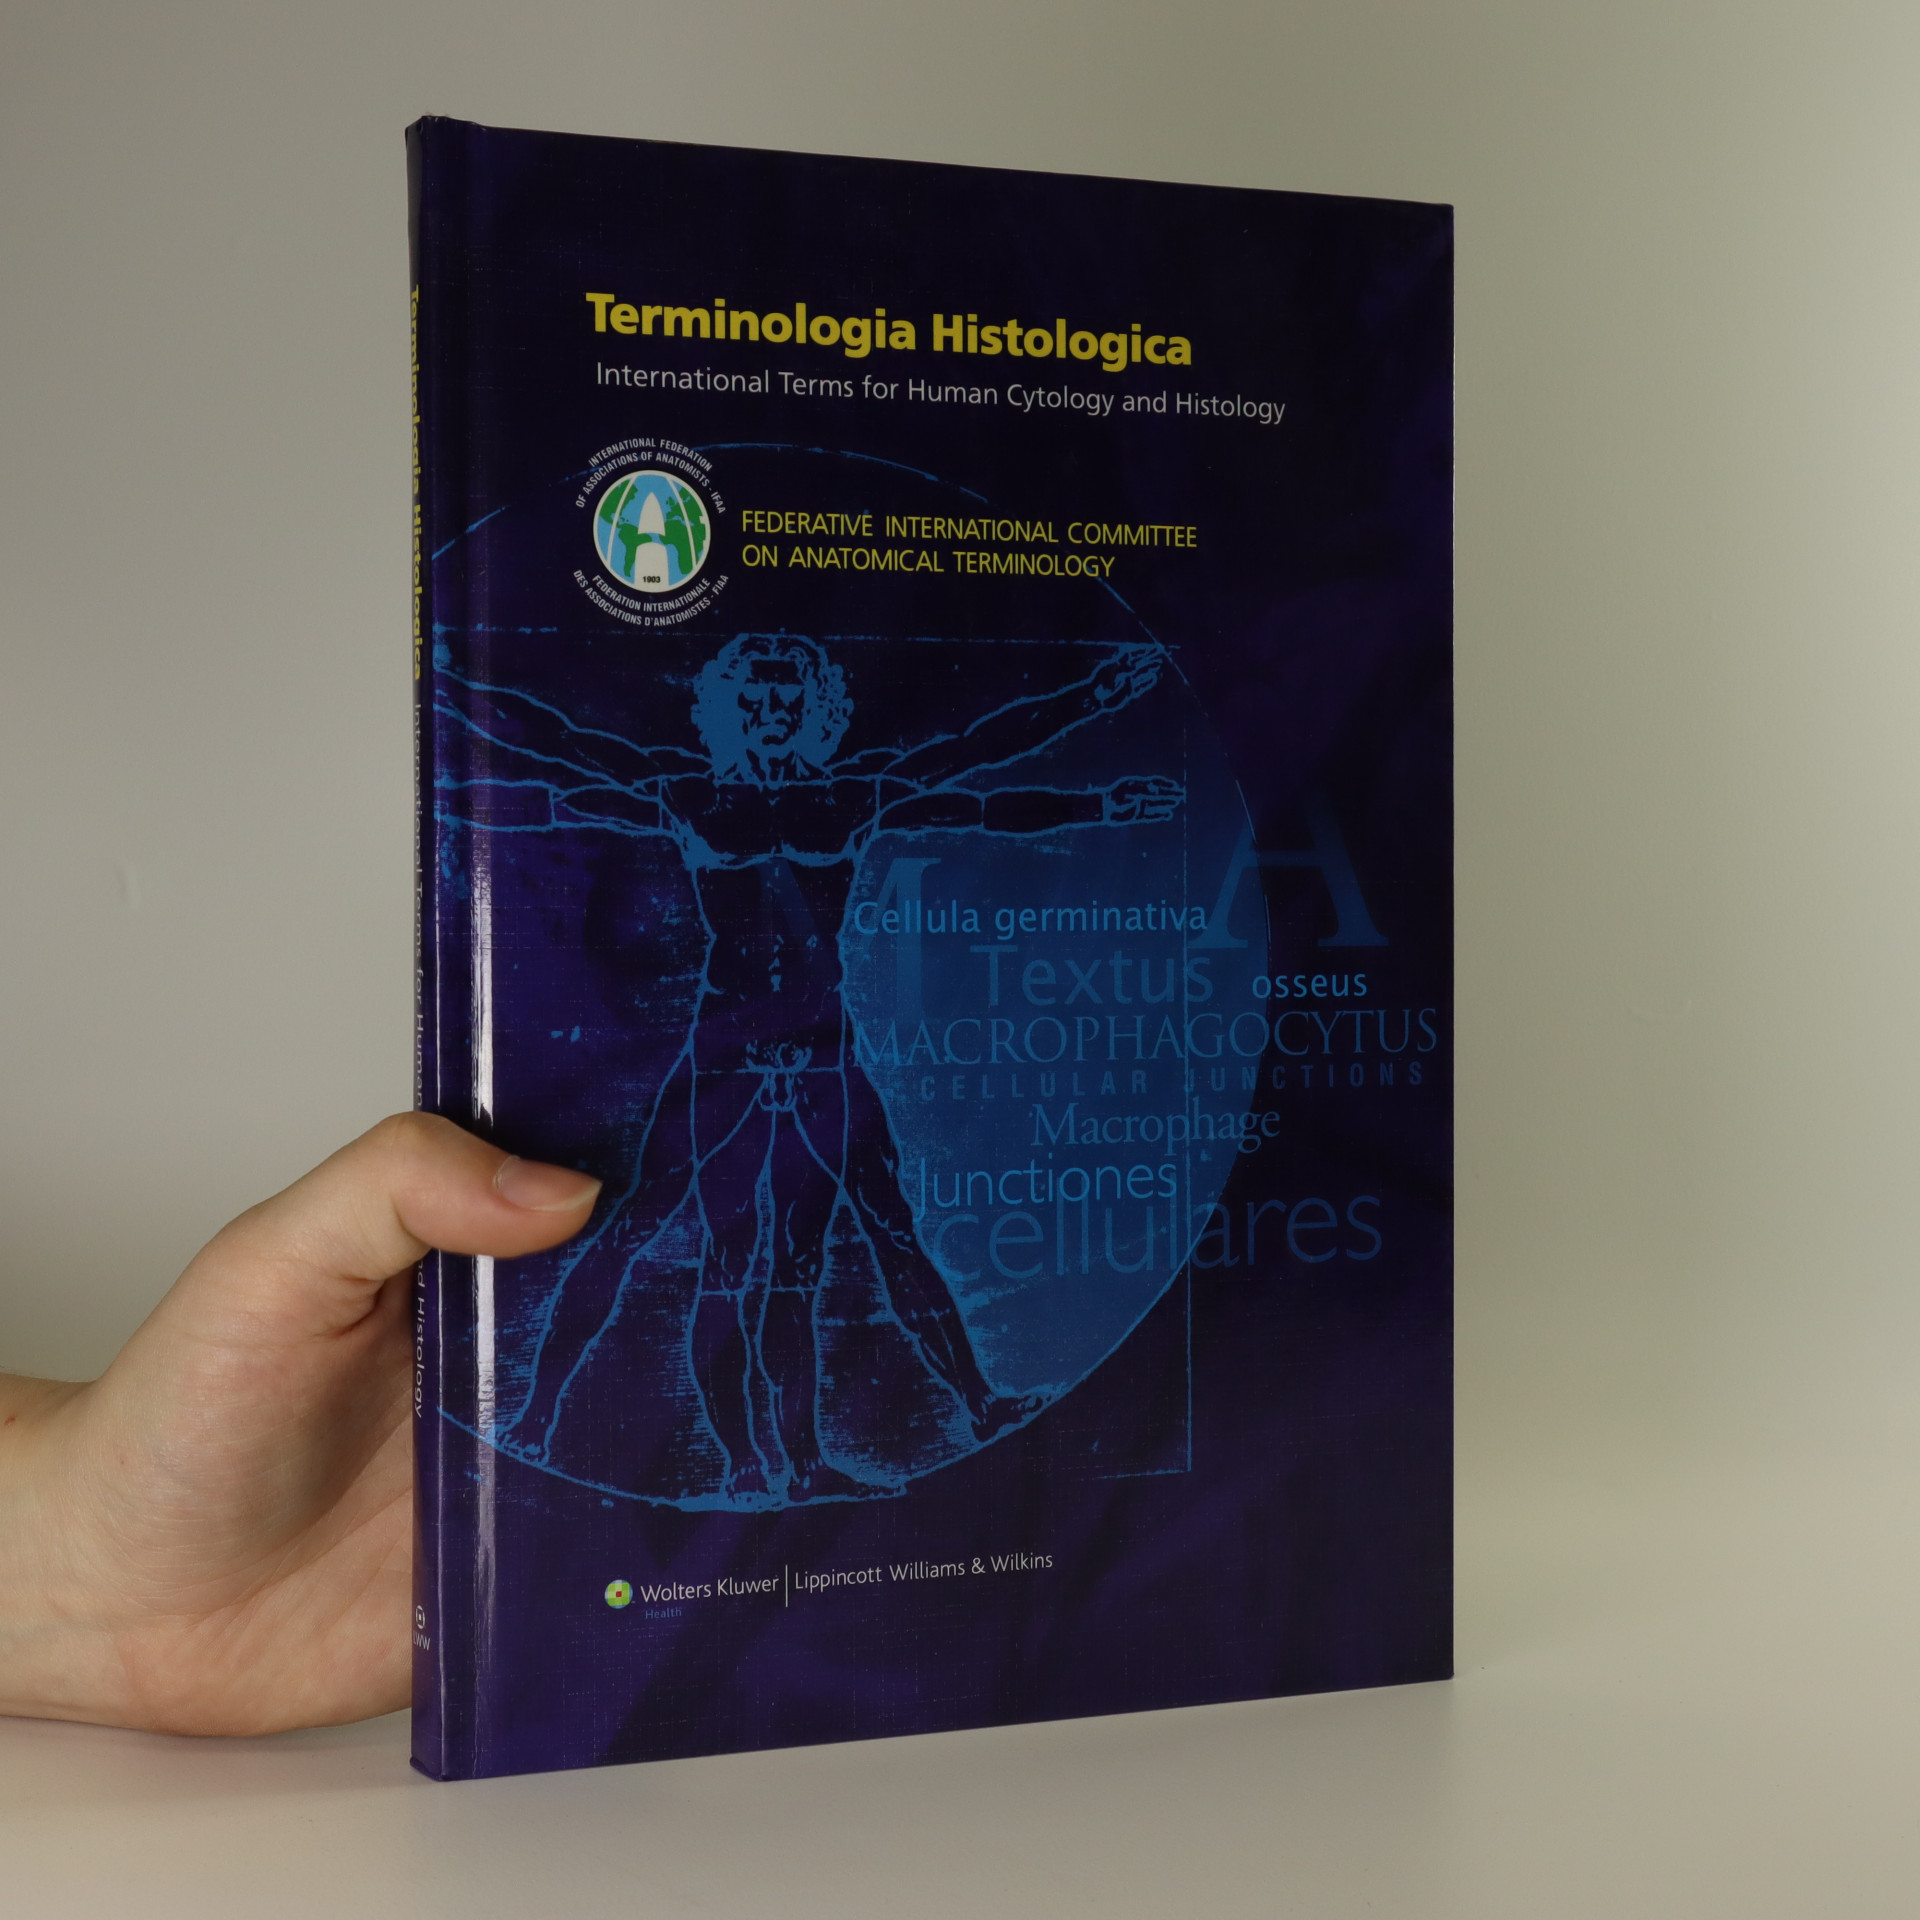 antikvární kniha Terminologia histologica. International terms for human cytology and histology, neuveden